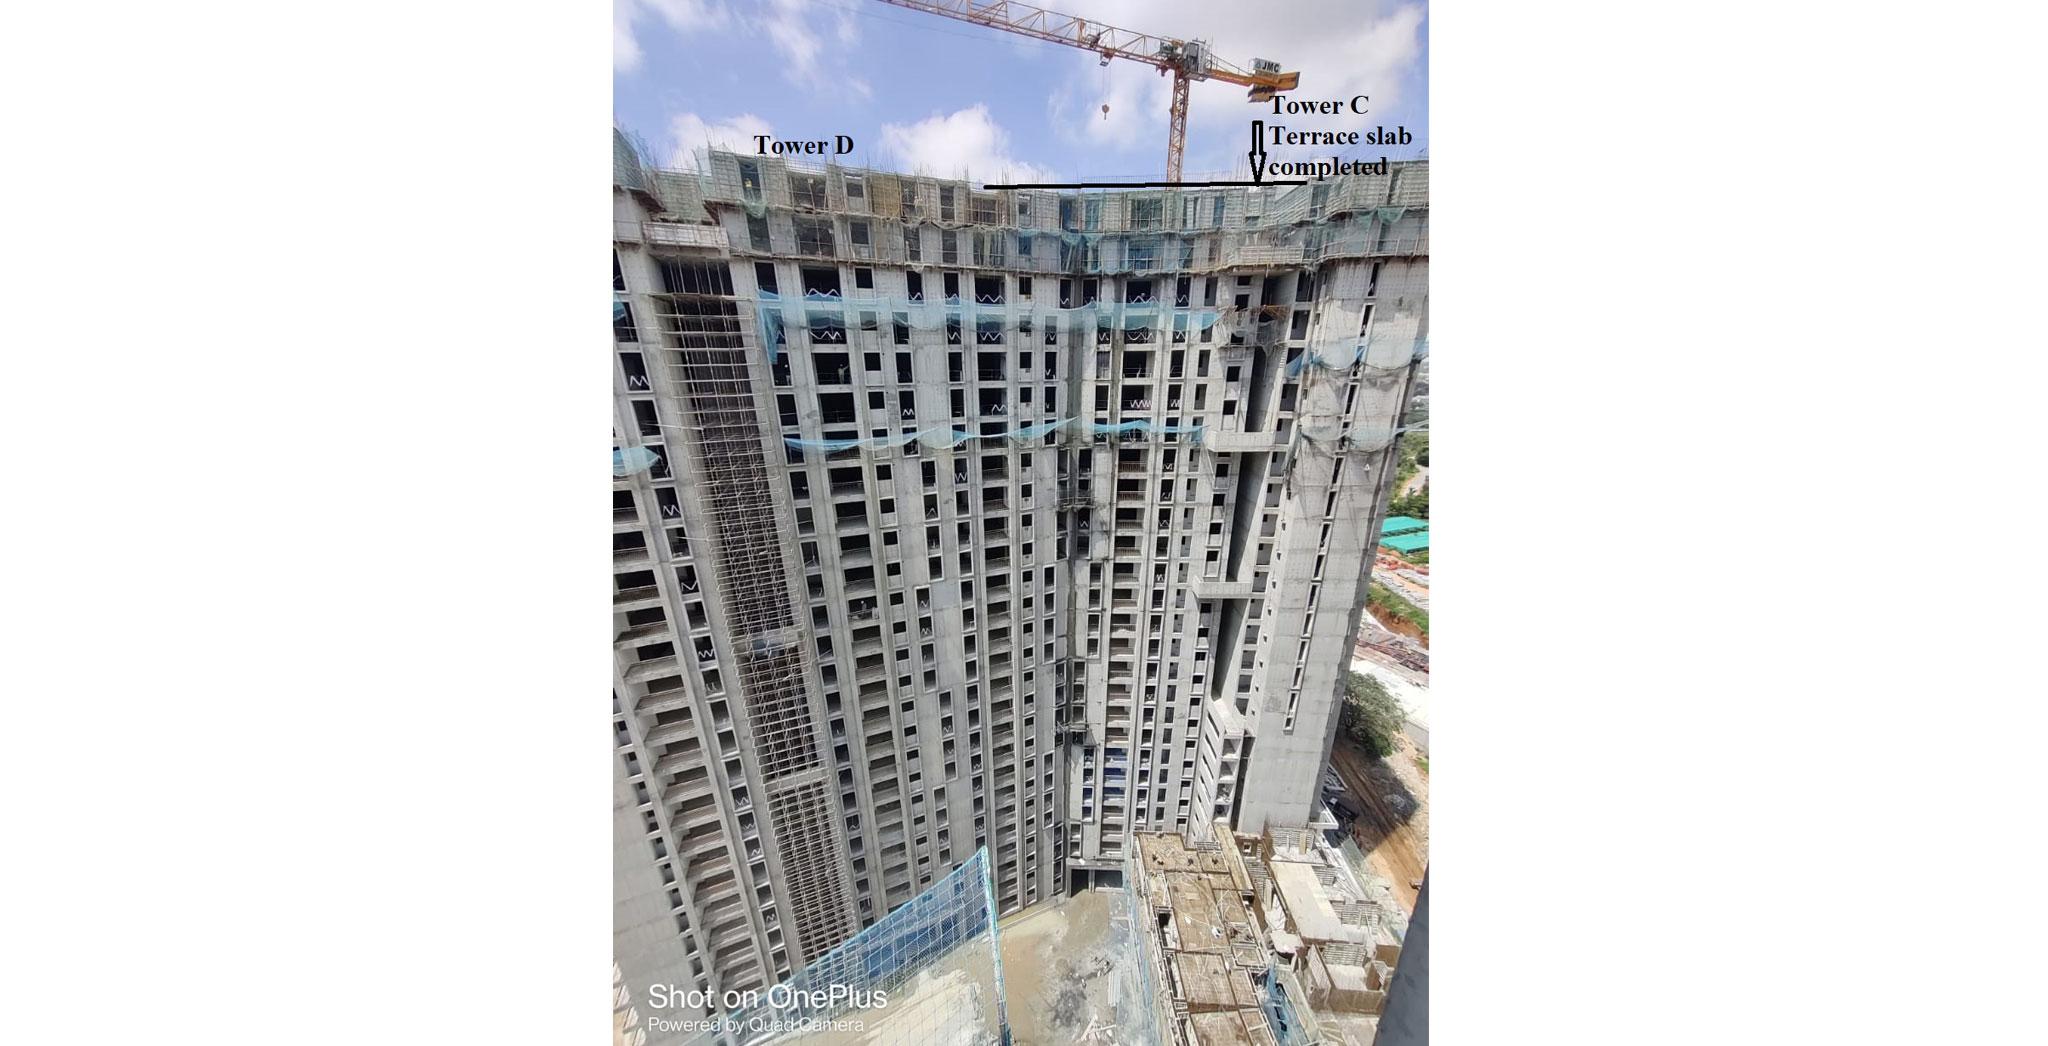 Aug 2021 - Brigade Cornerstone Utopia Serene Tower/Wing C: Casting of Terrace Floor Slab